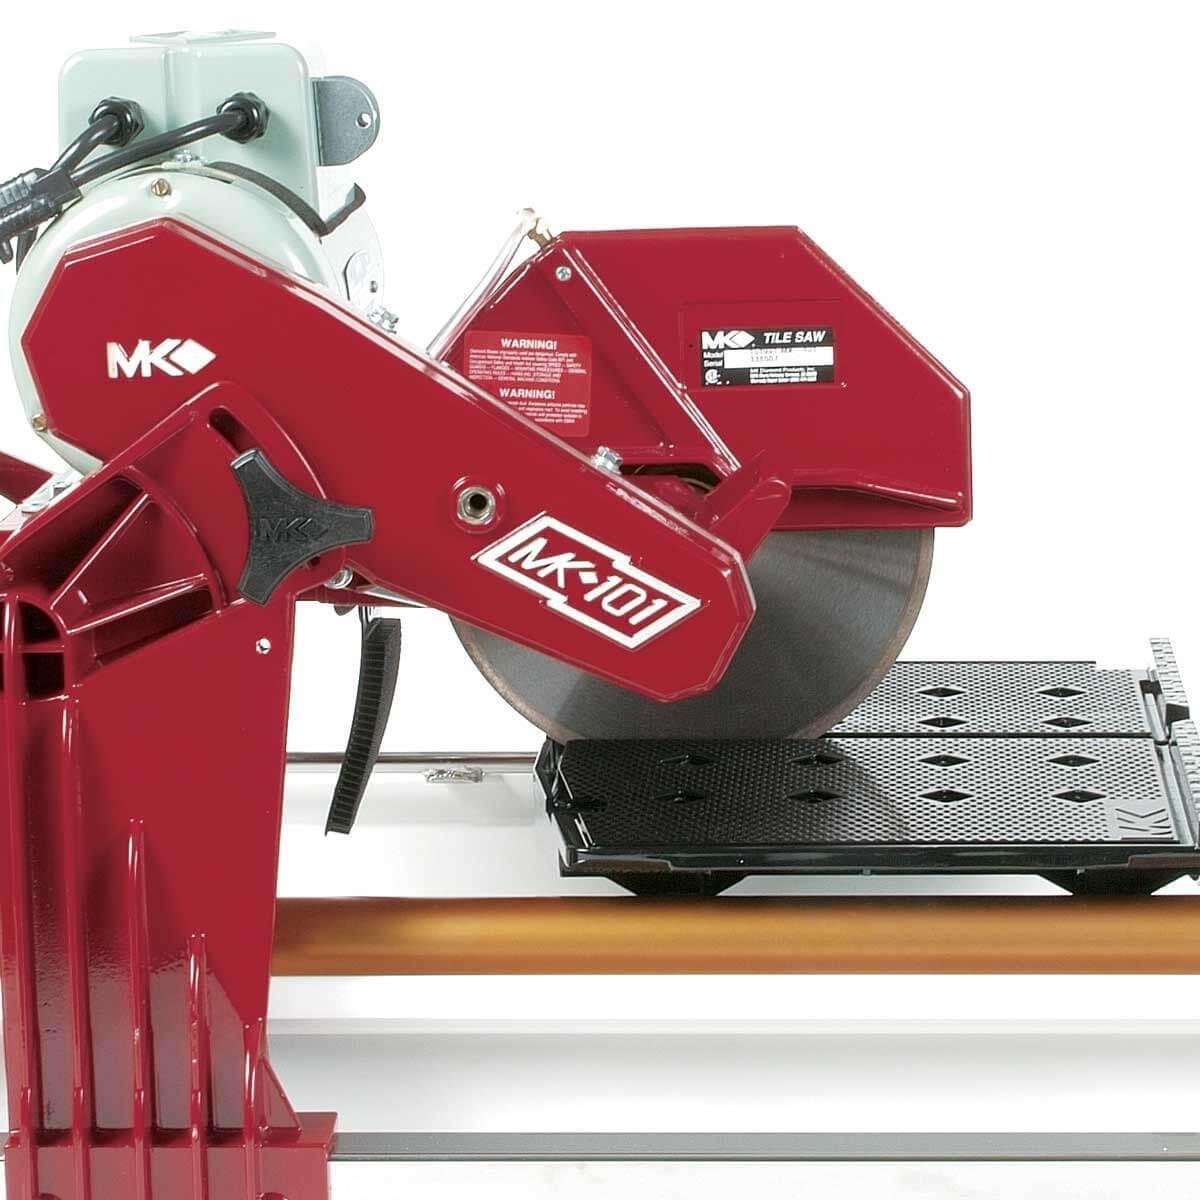 MK Diamond MK-101-24 Tile saw cutting head